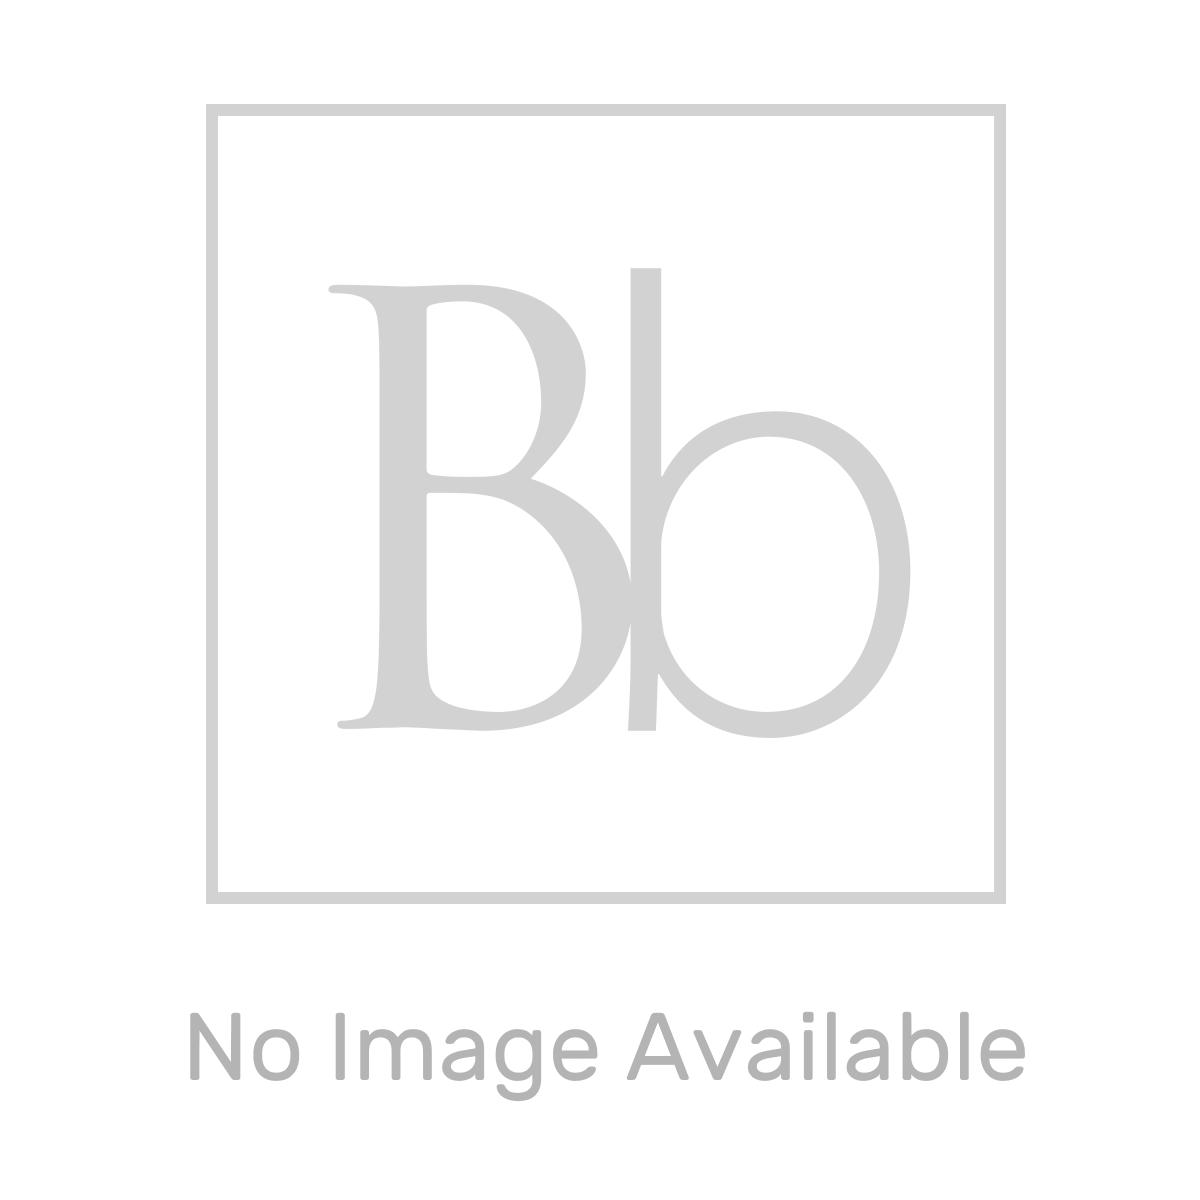 Homelux Aluminium Straight Edge 12.5mm Stainless Steel Tile Trim 2.5m